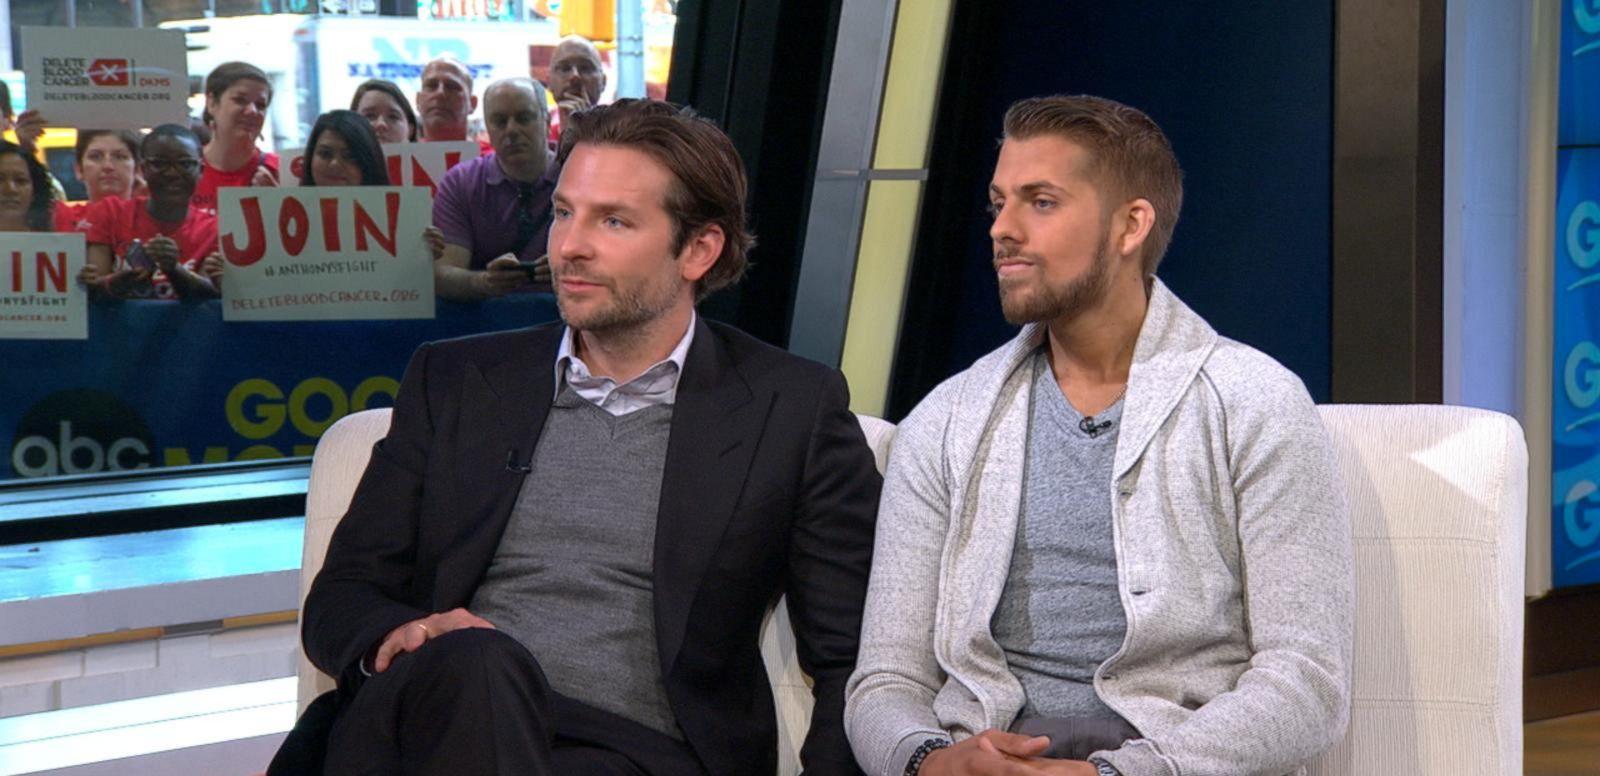 VIDEO: Bradley Cooper Raises Awareness of Bone Marrow Donation to Save Man's Life